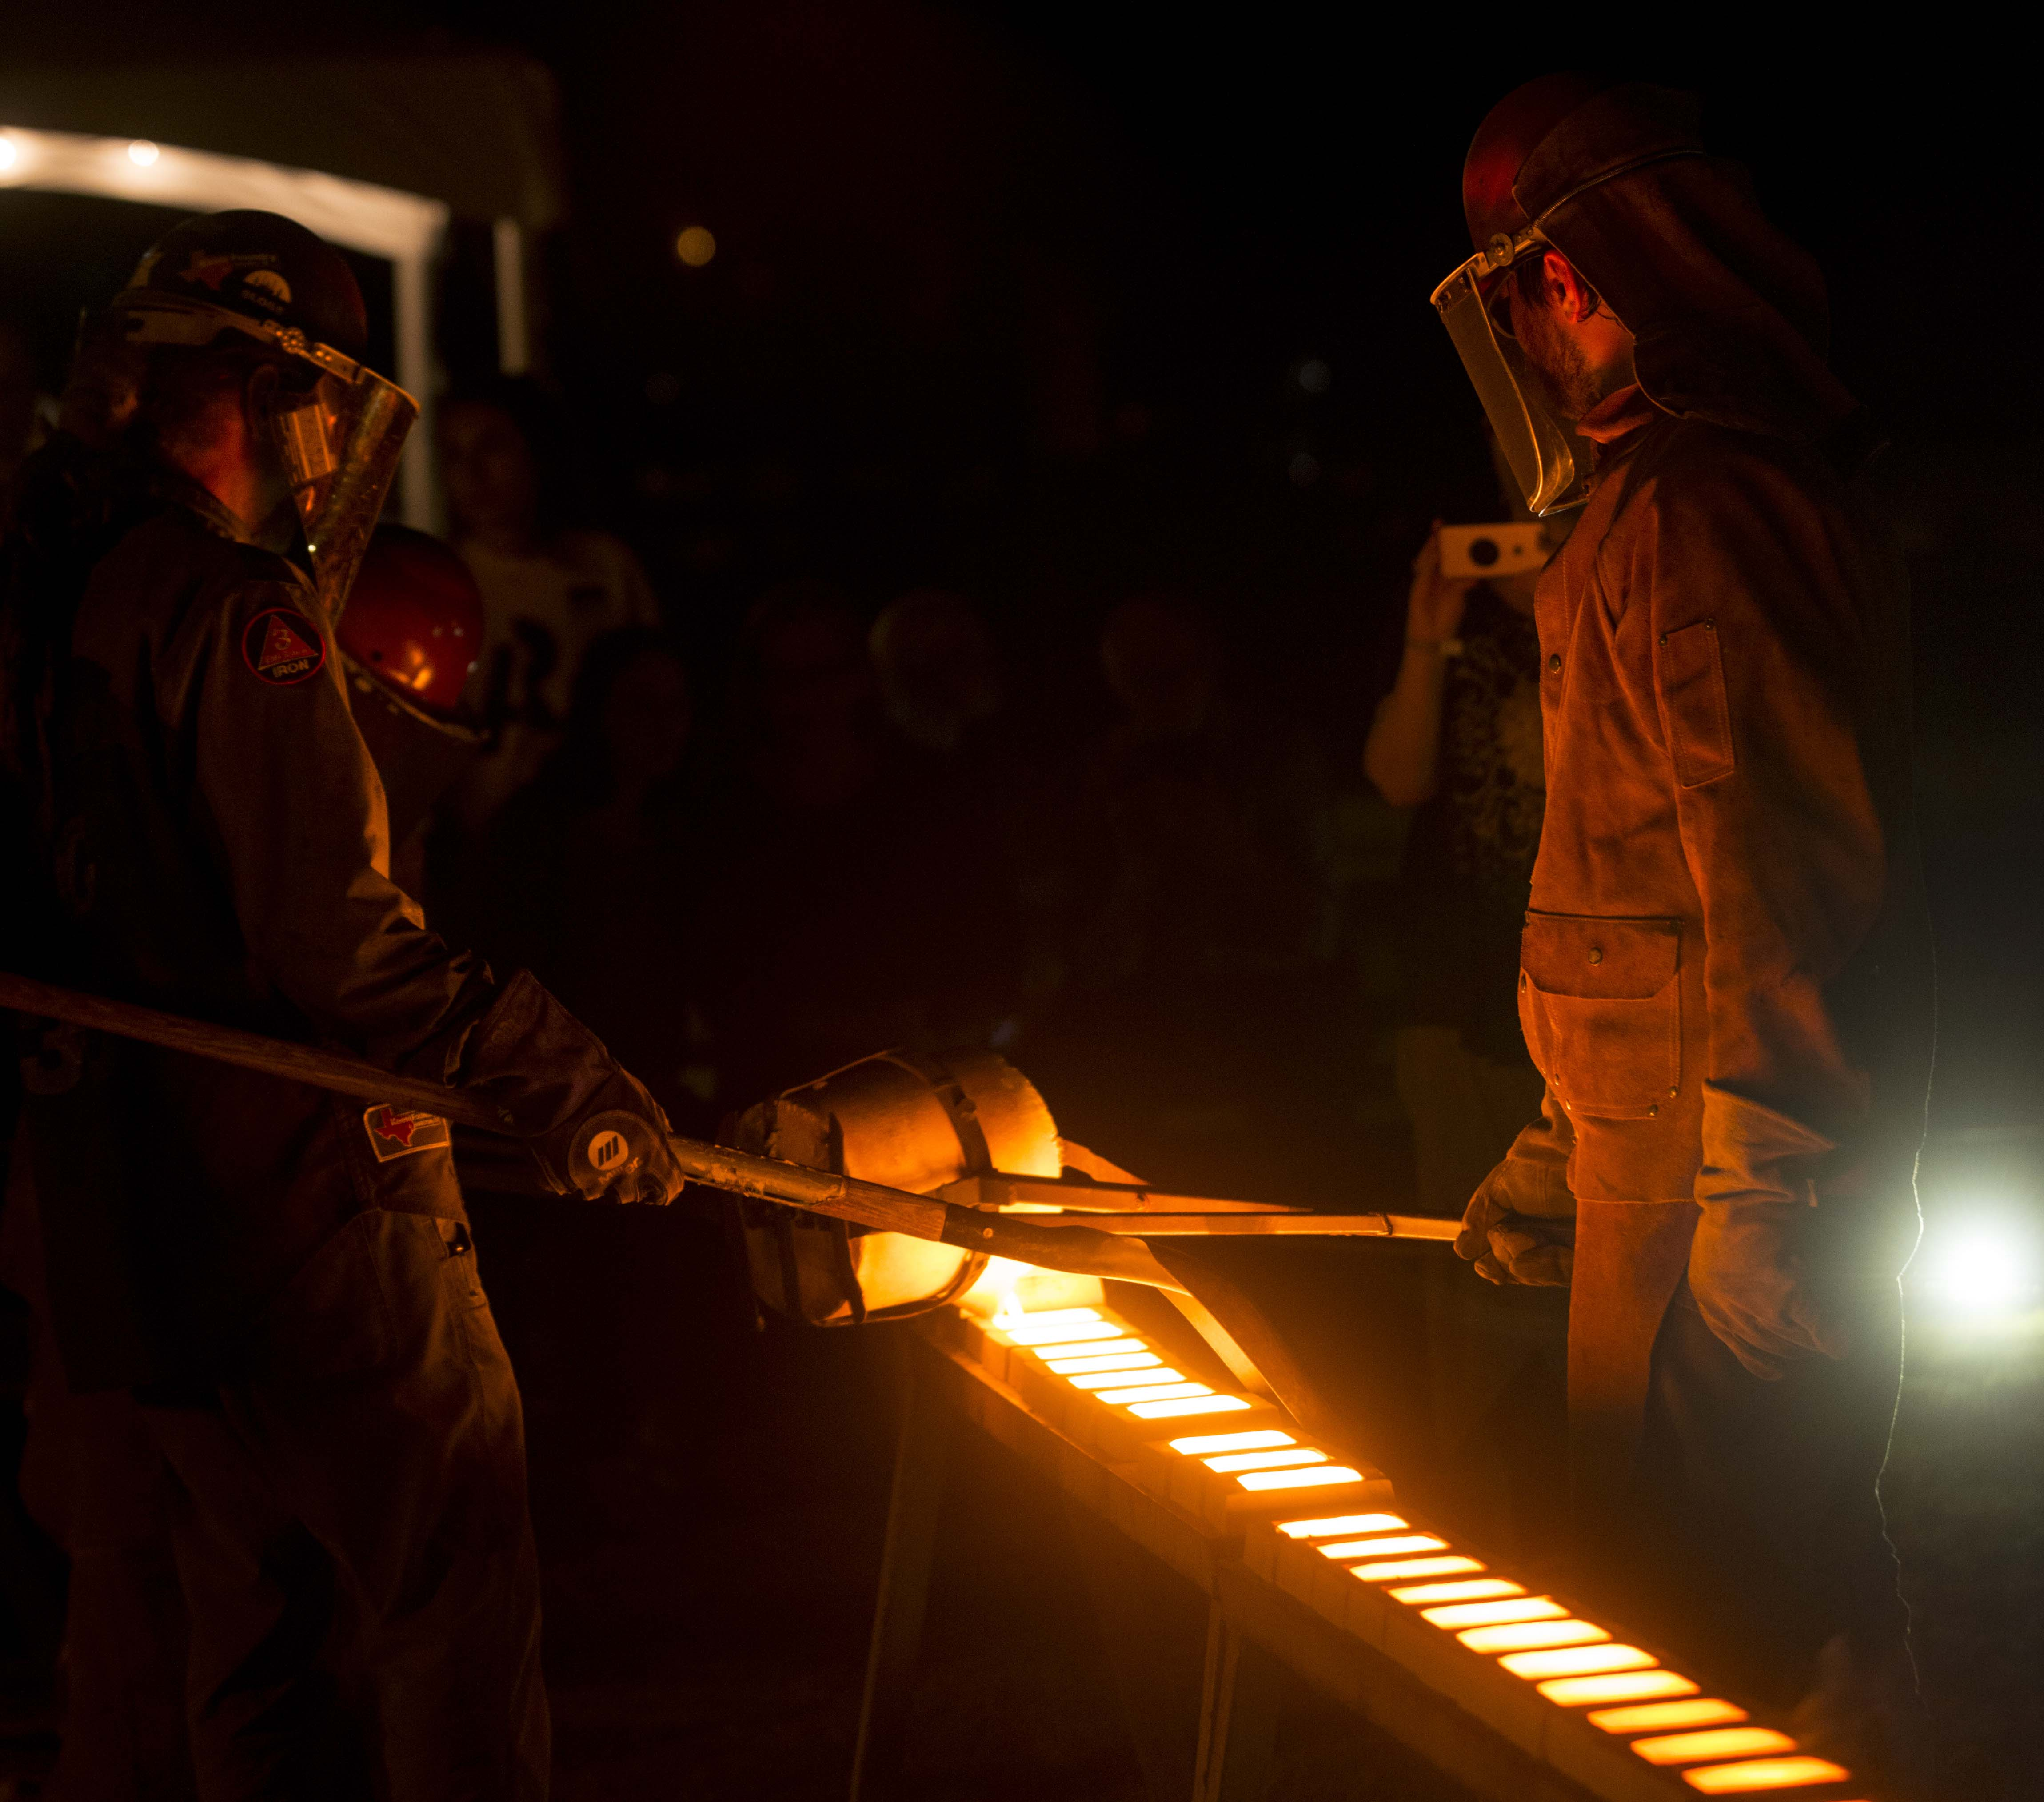 Sloss Metal Artists pour iron into molds